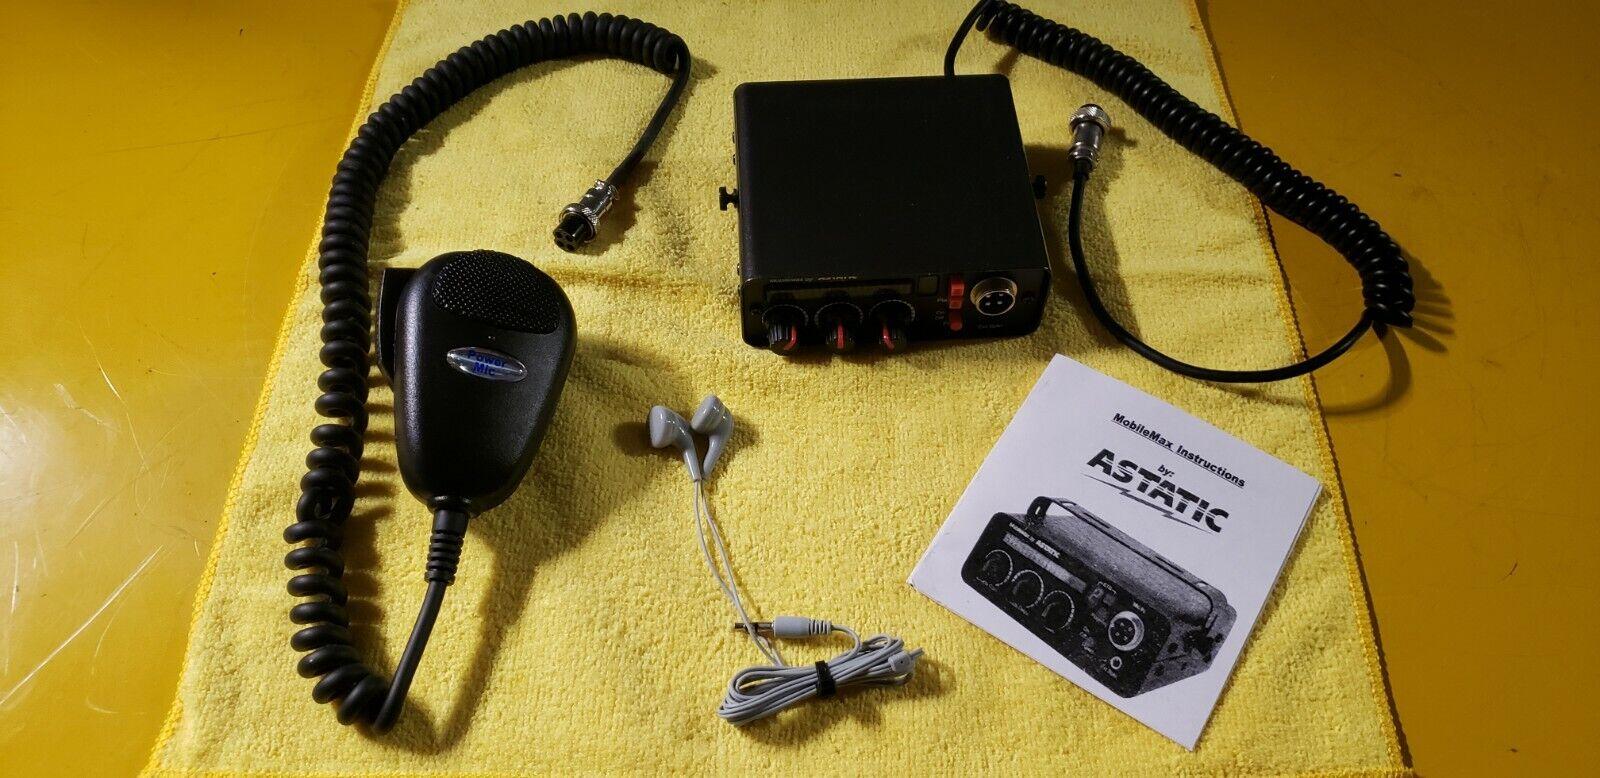 ASTATIC MOBILEMAX DIGITAL SOUND BOARD*MAGIC IN A BOX*9 UNIQUE ETS TONES*6SEC REC. Available Now for 649.00